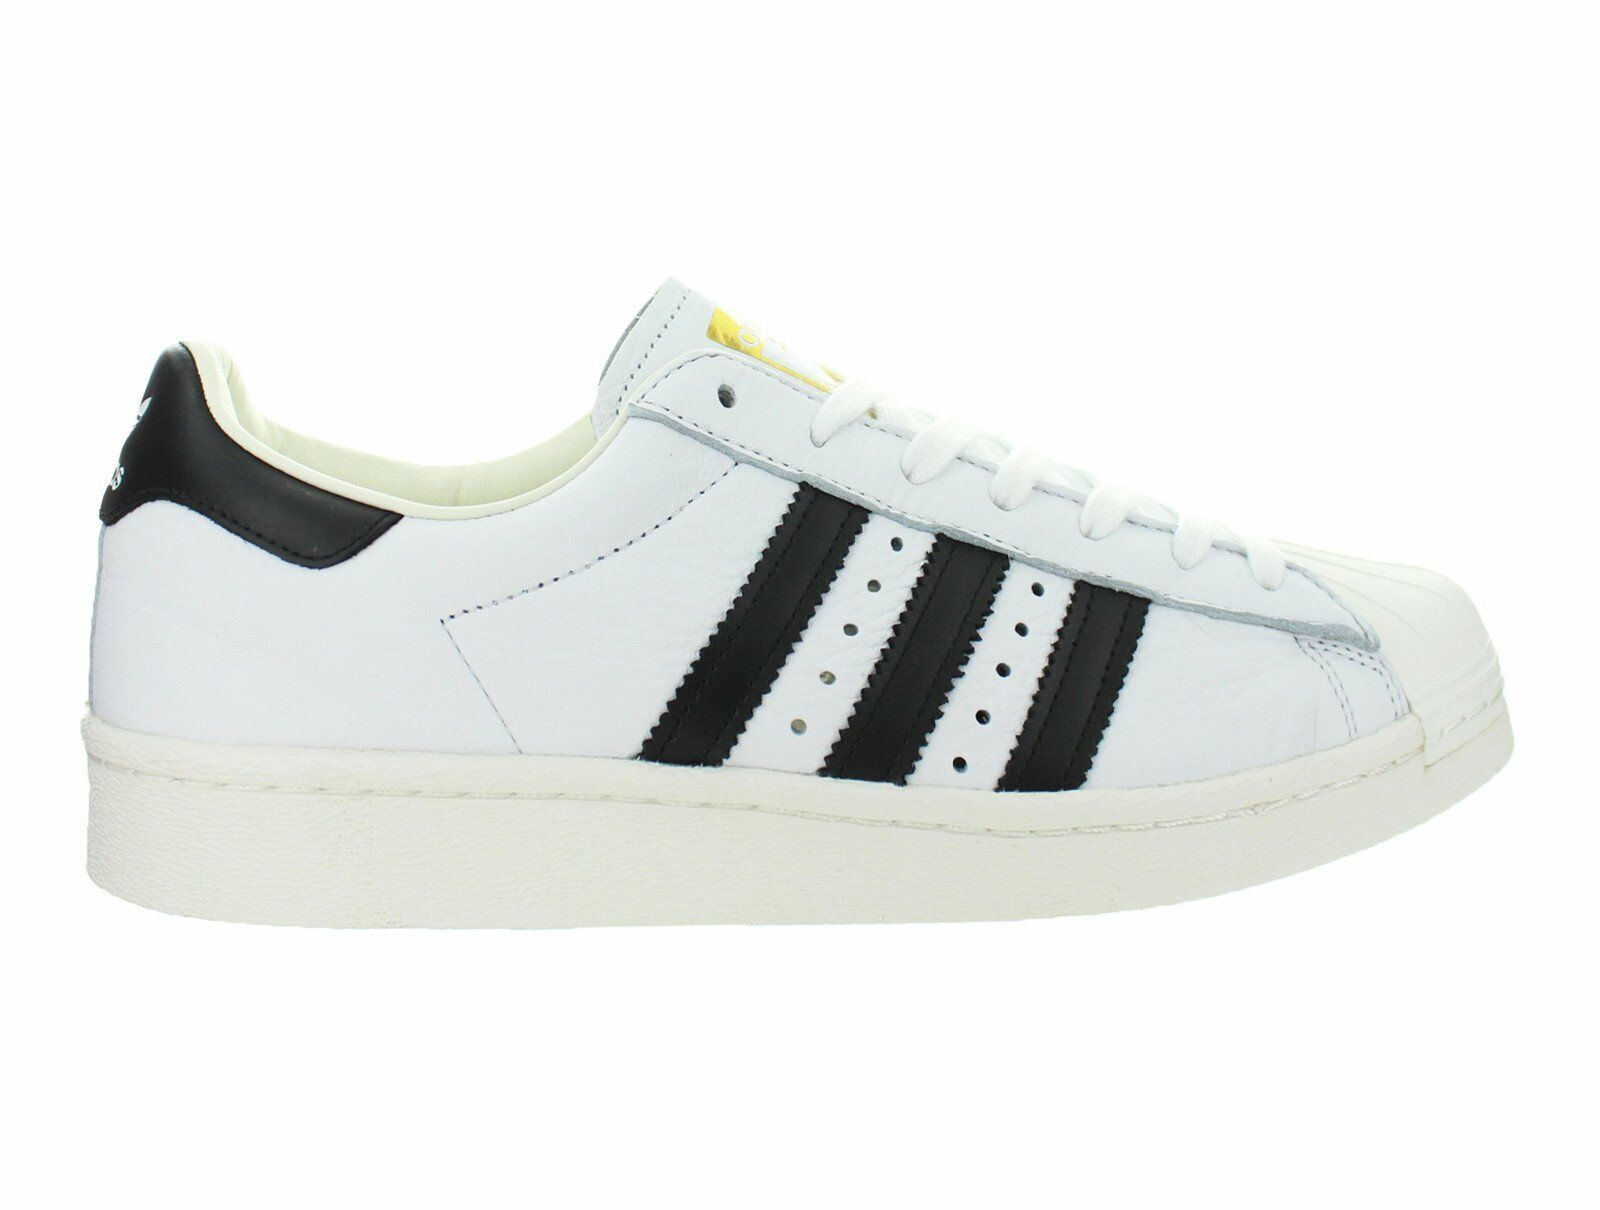 Mens Adidas Superstar Gold Boost White Core Black Gold Superstar Metallic BB0188 23aeb2